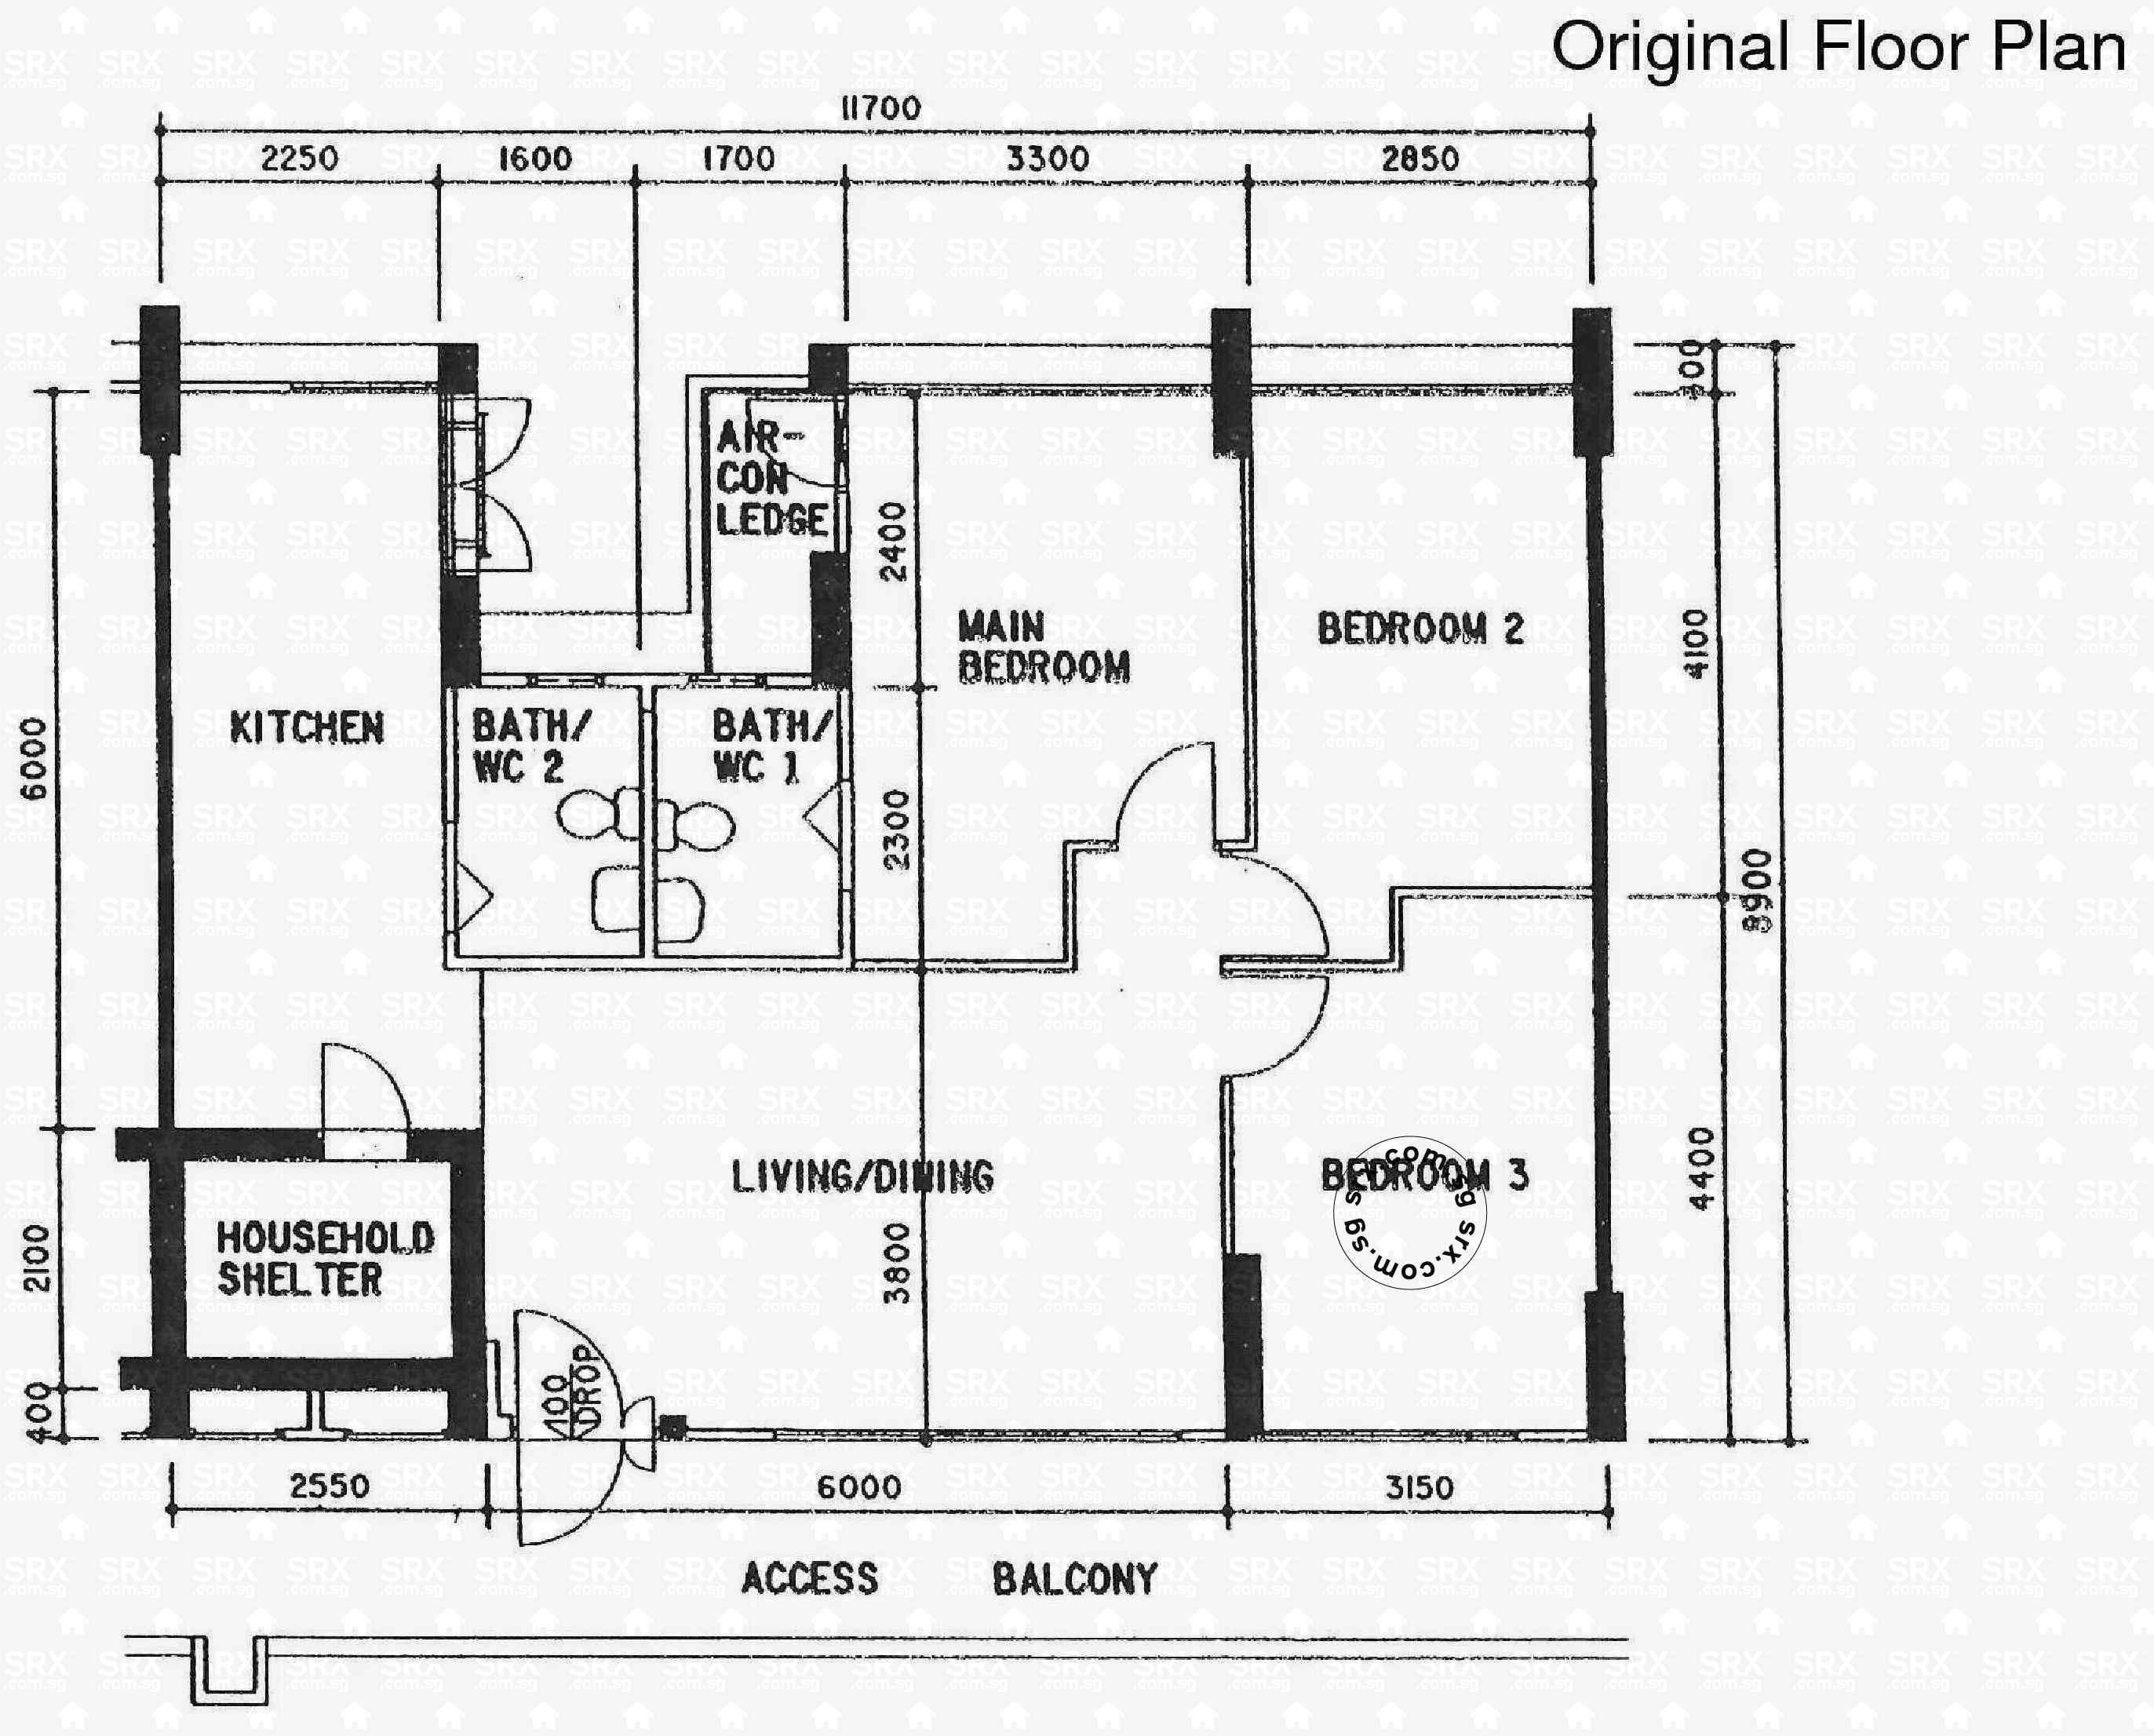 Floor Plans For Jurong West Street 65 HDB Details